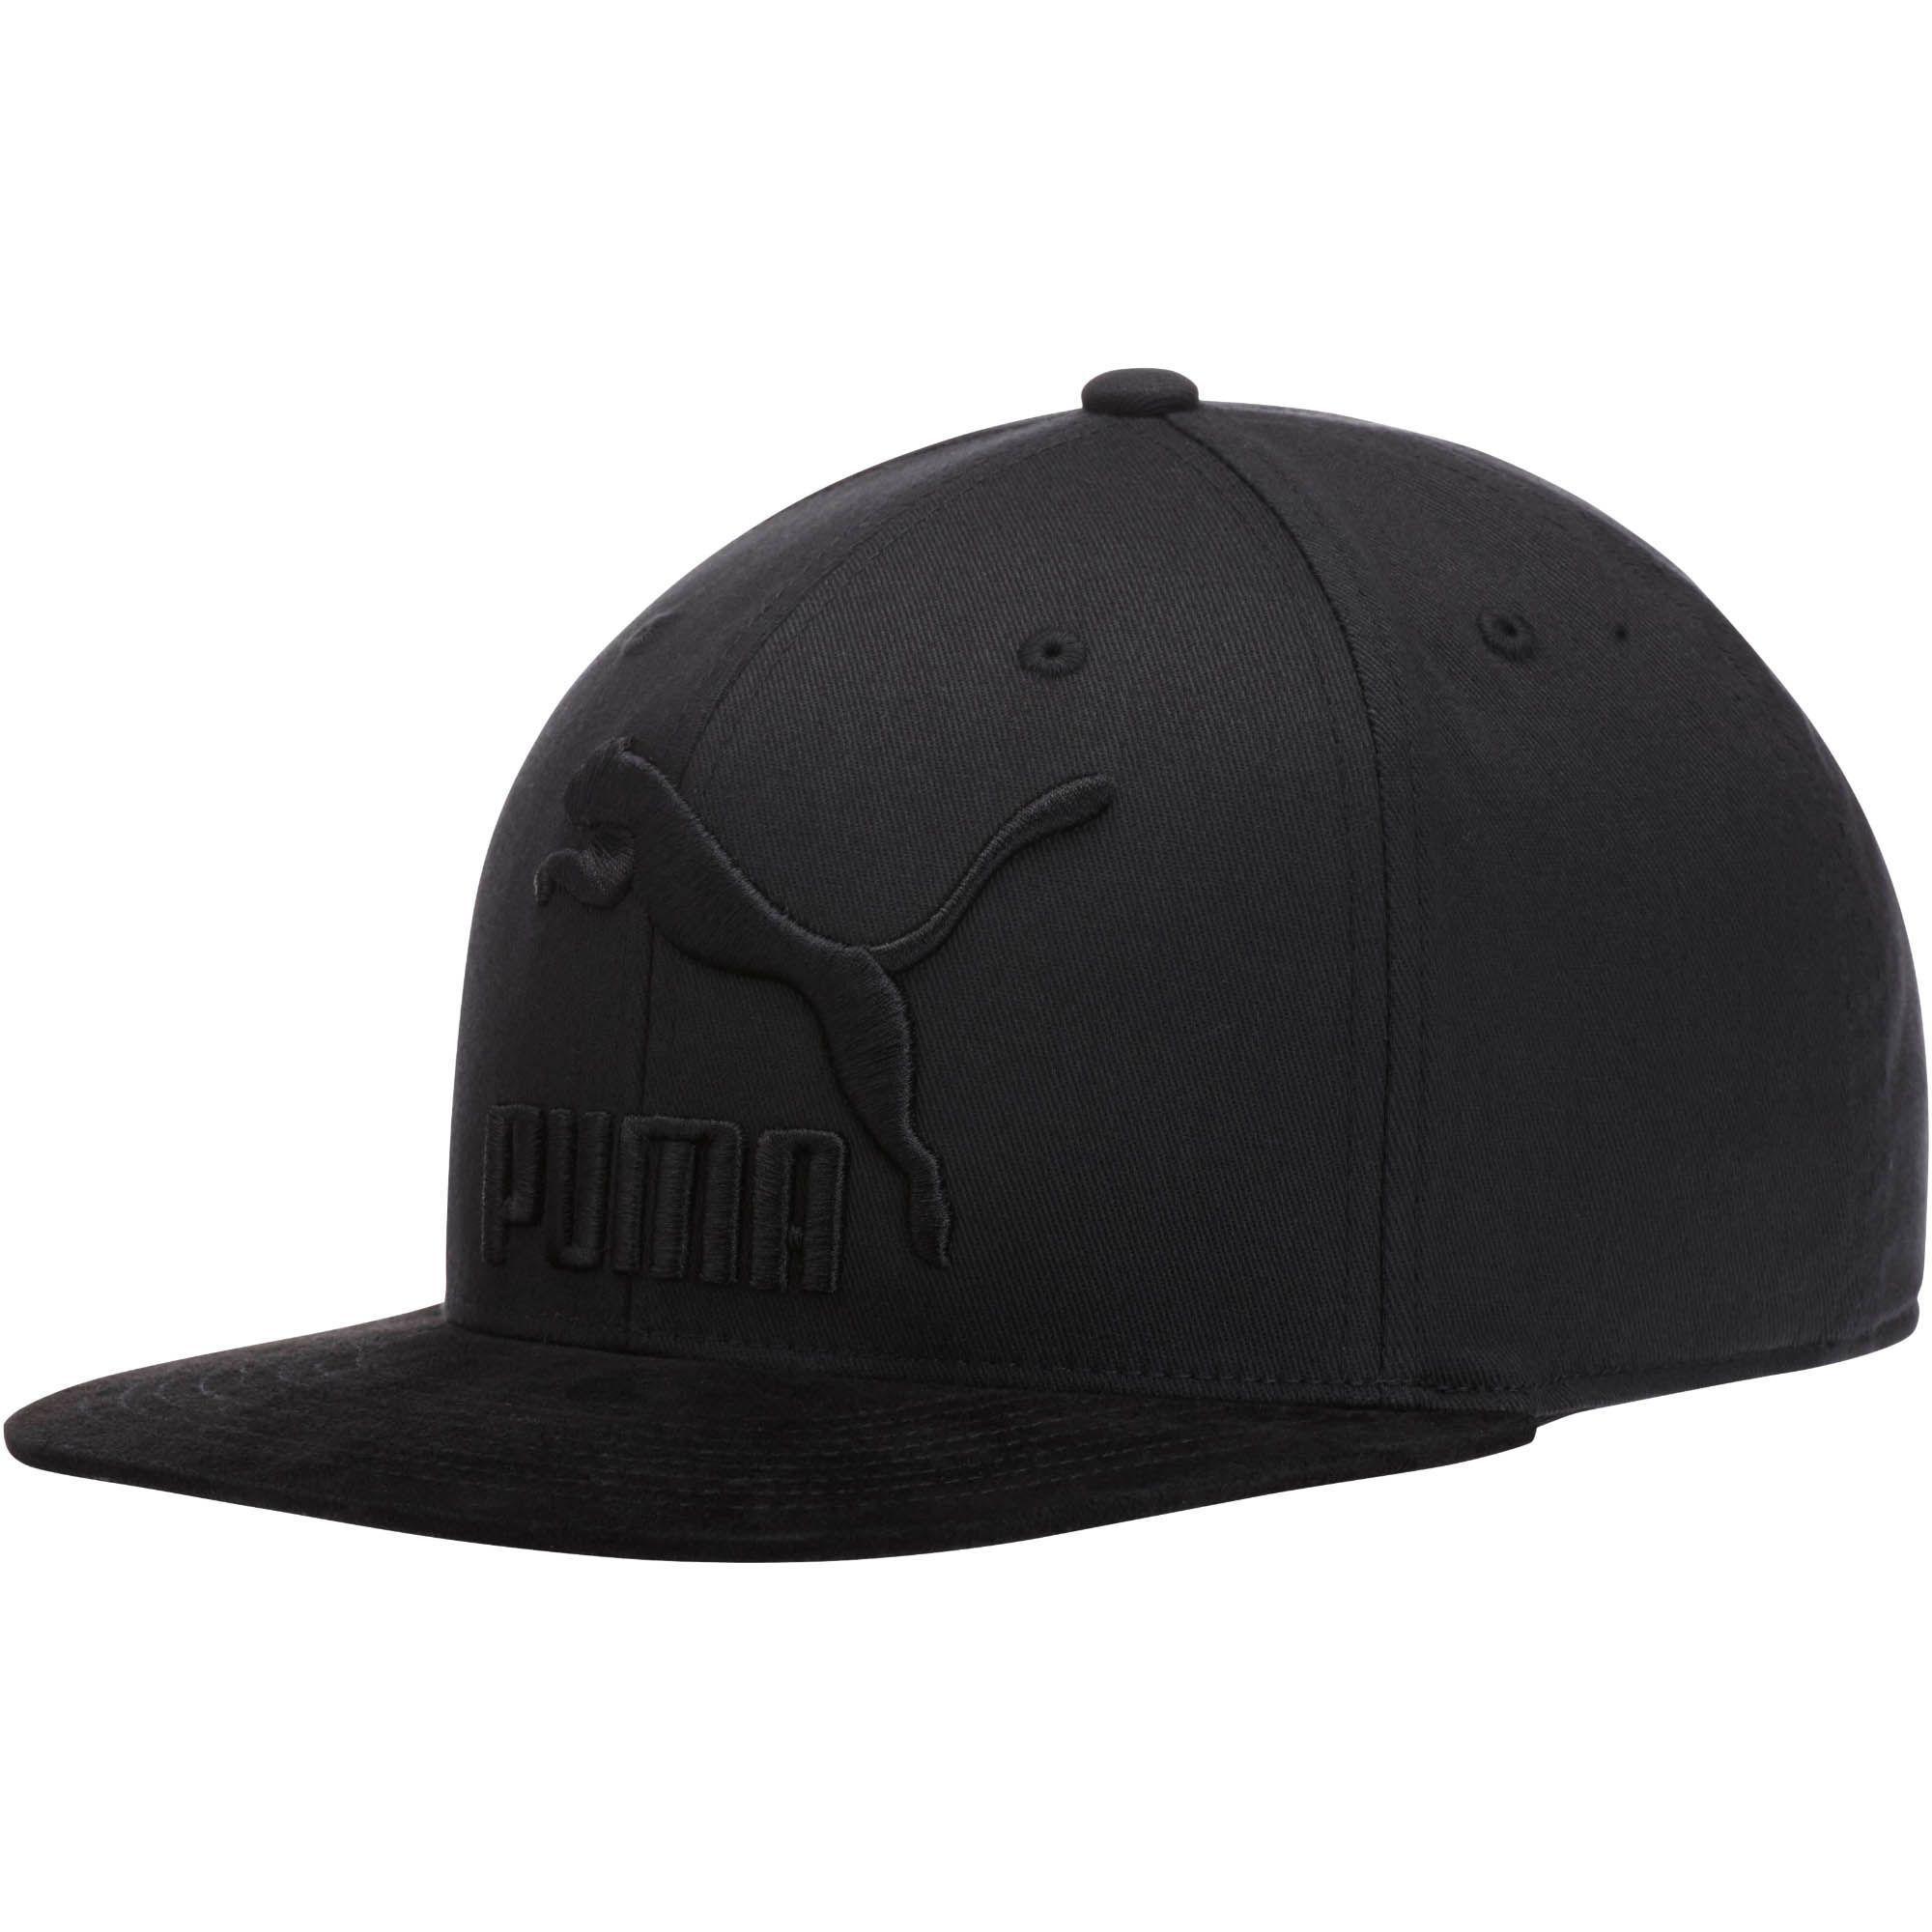 ac6d2fa3fa013 france puma golf p 110 snapback cap d47a6 b4bb1  sale lyst puma suede 110  snapback hat in black for men 0275b b0547